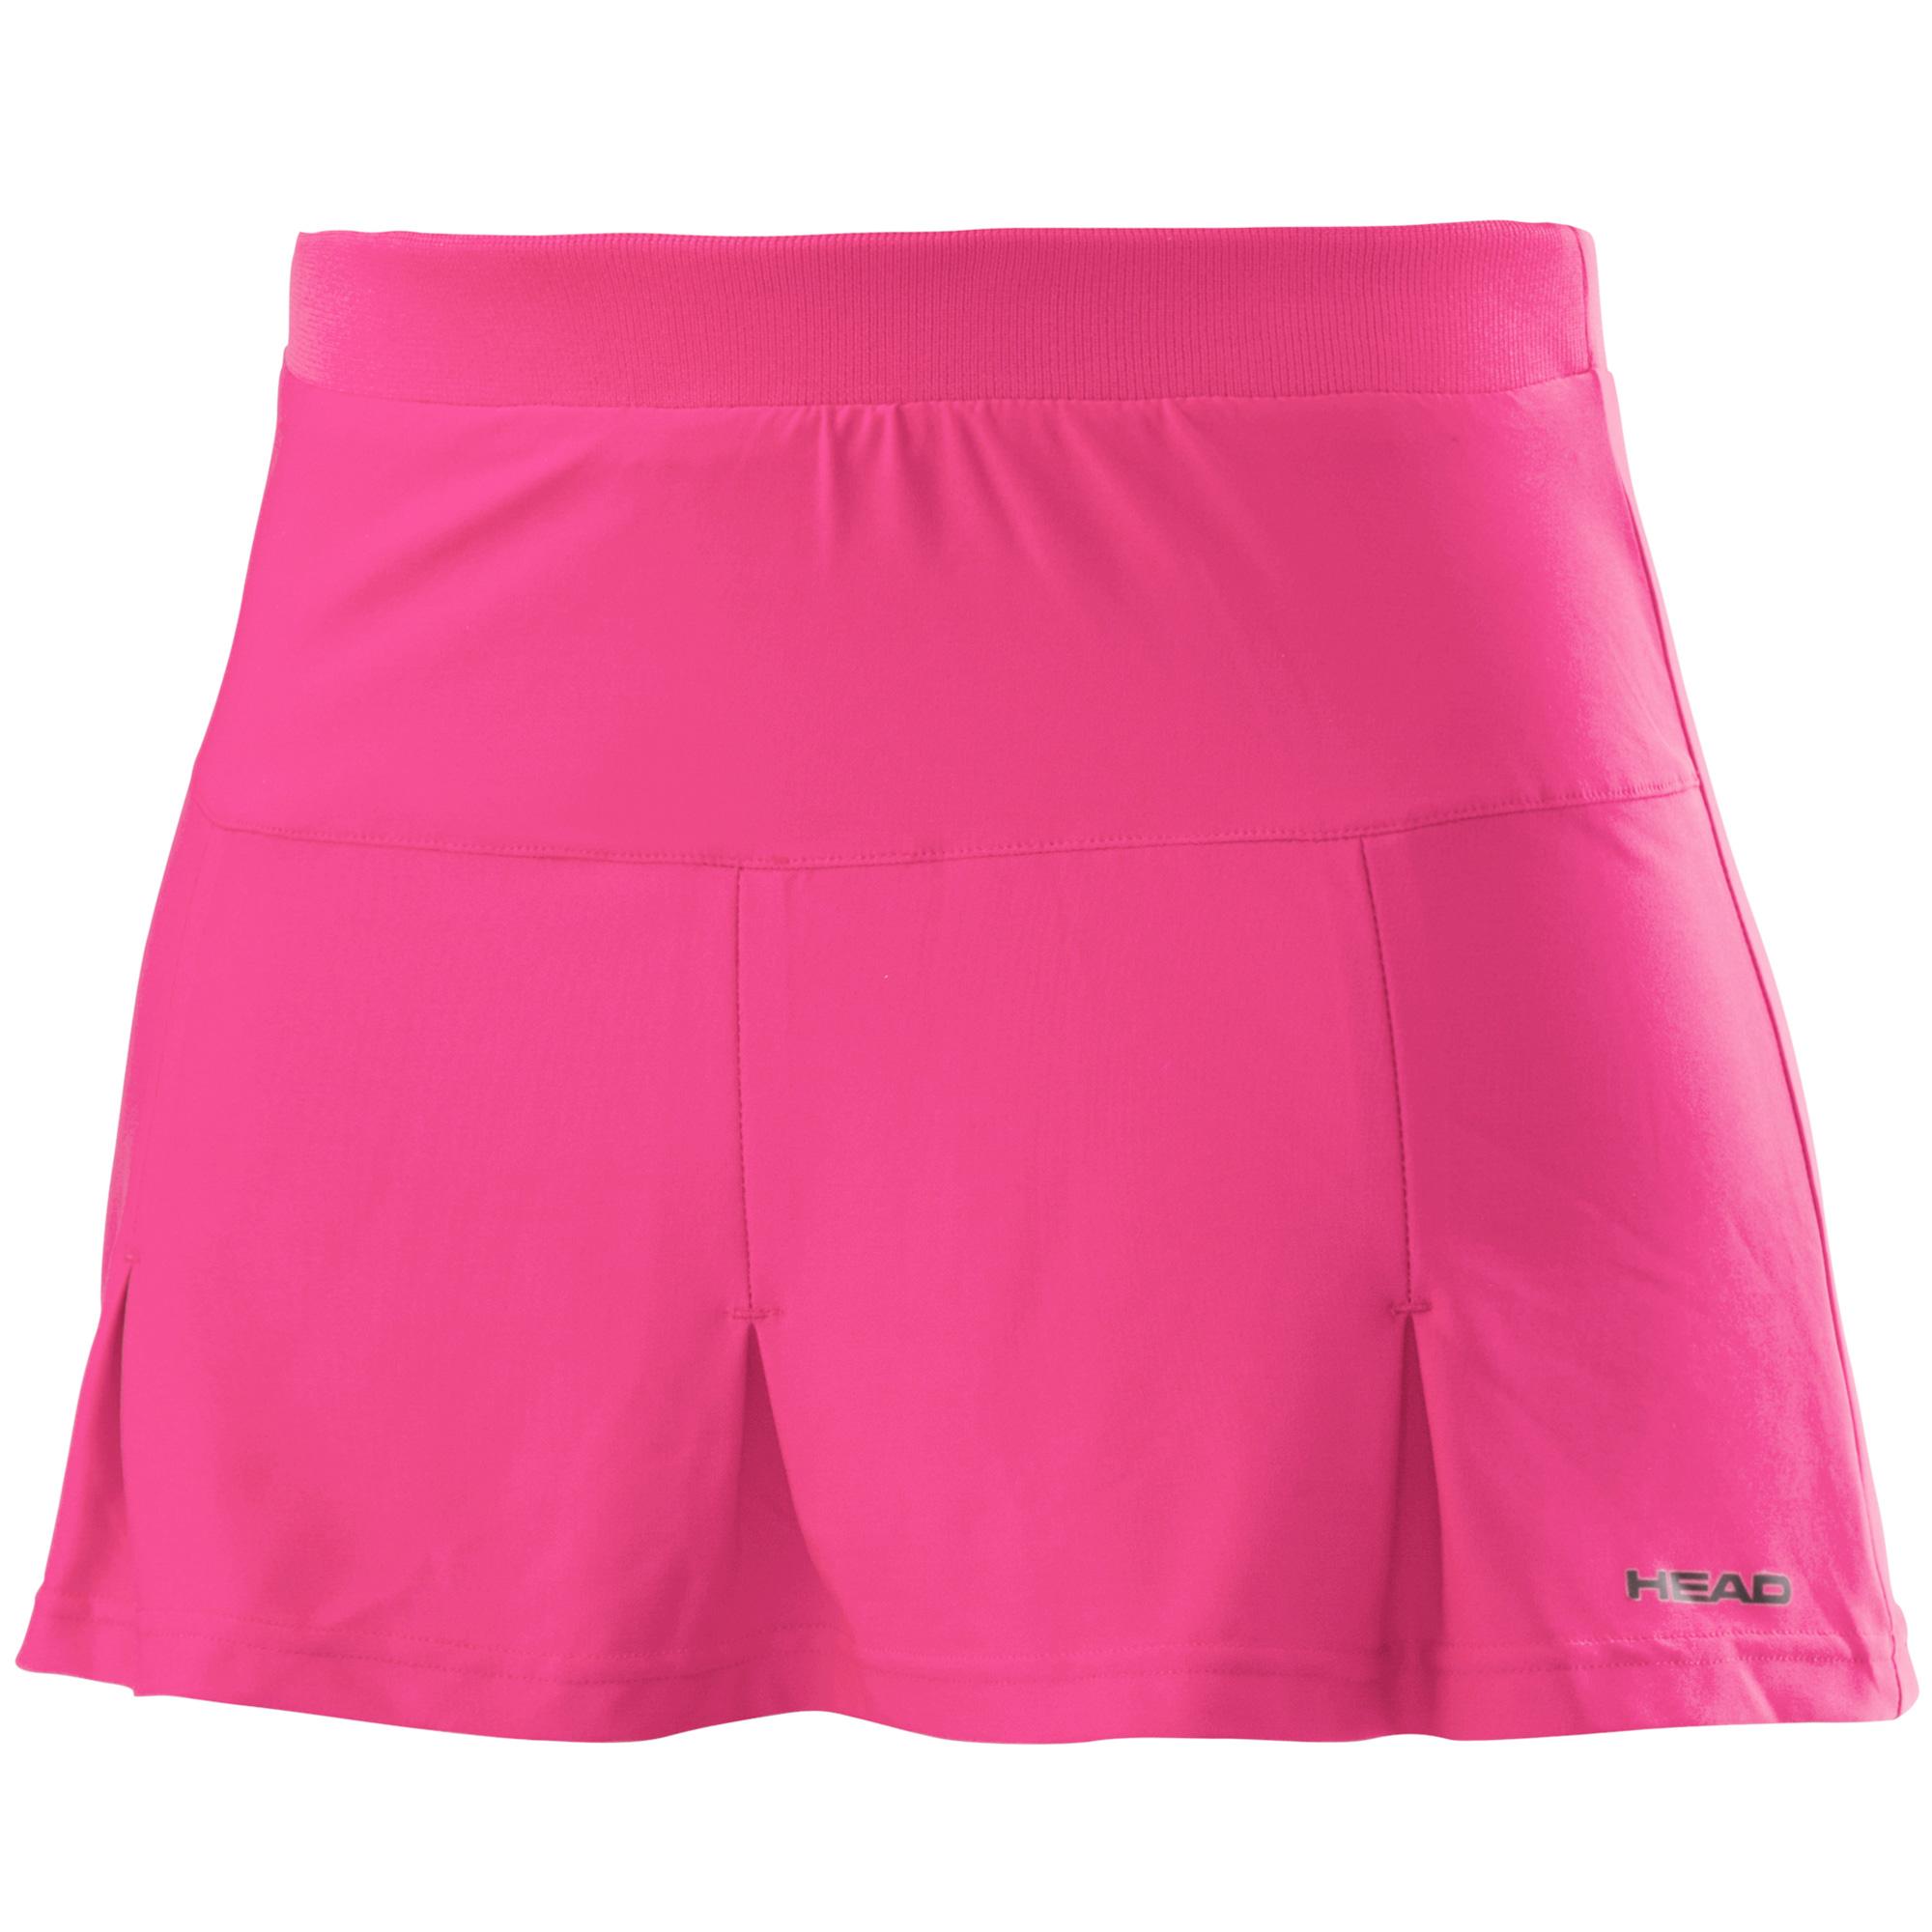 Head Club Basic Girls Skort - Pink, L